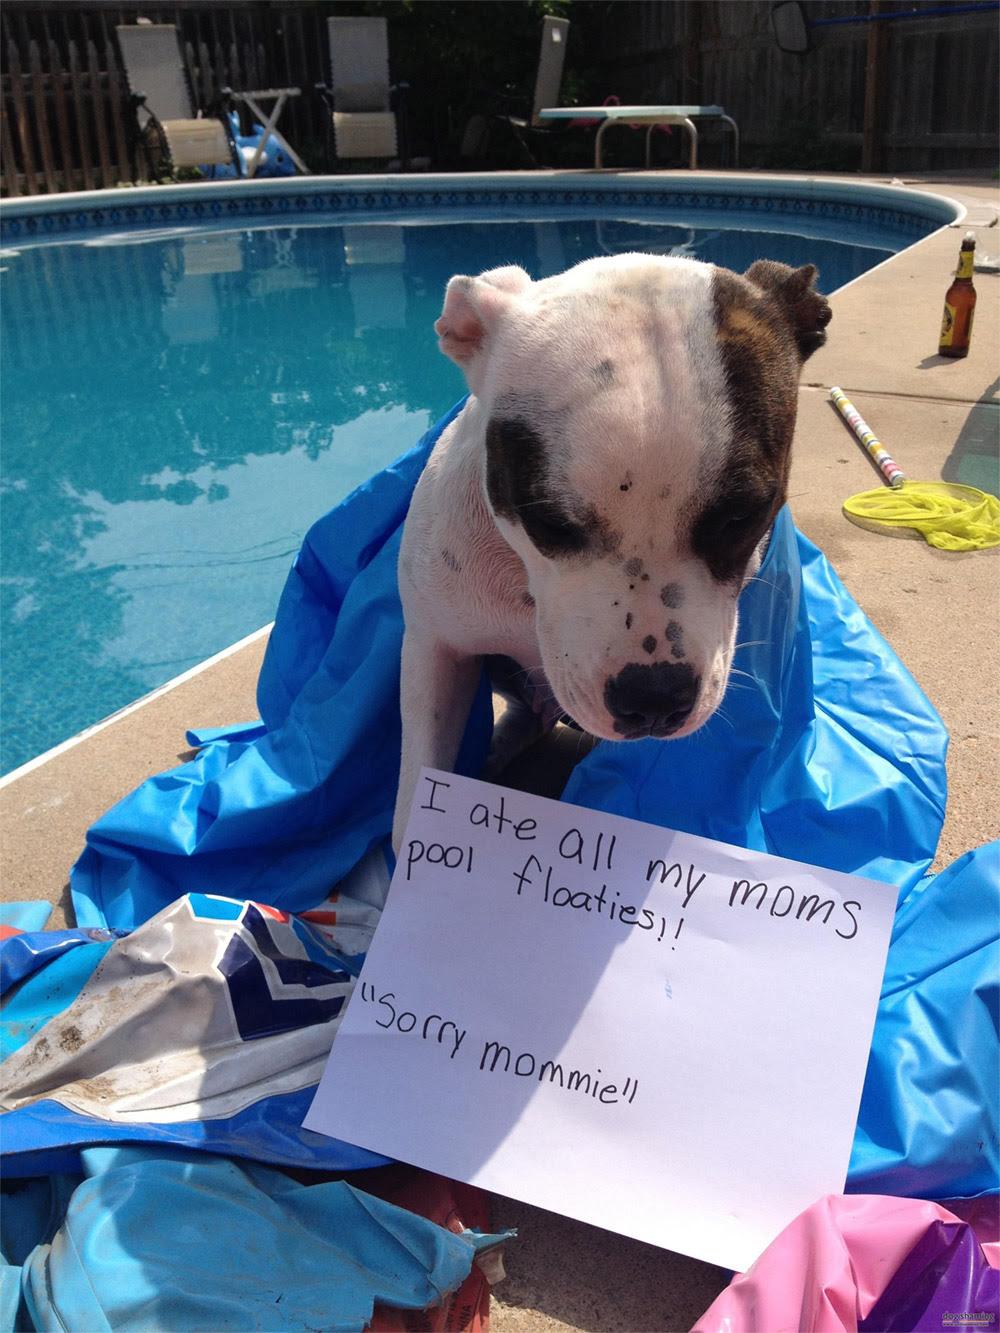 dog shaming 28 32 Hillarious Public Shaming of Dogs